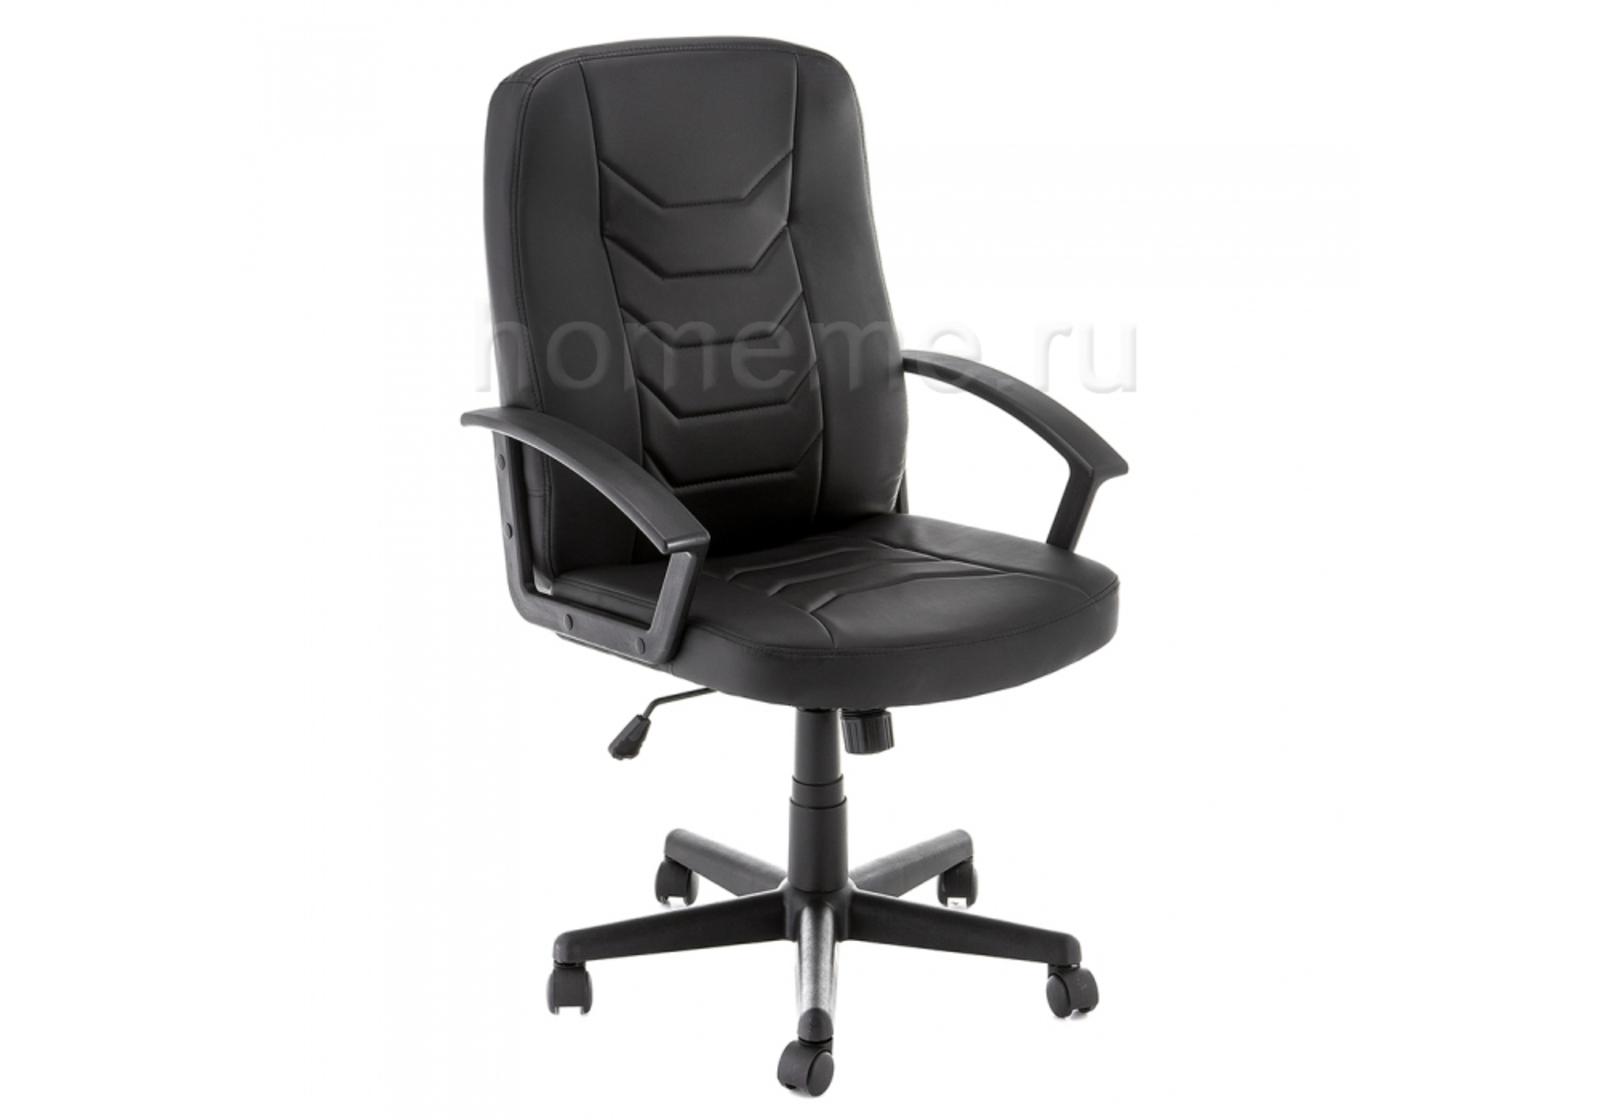 Кресло для офиса HomeMe Darin черное 11264 от Homeme.ru